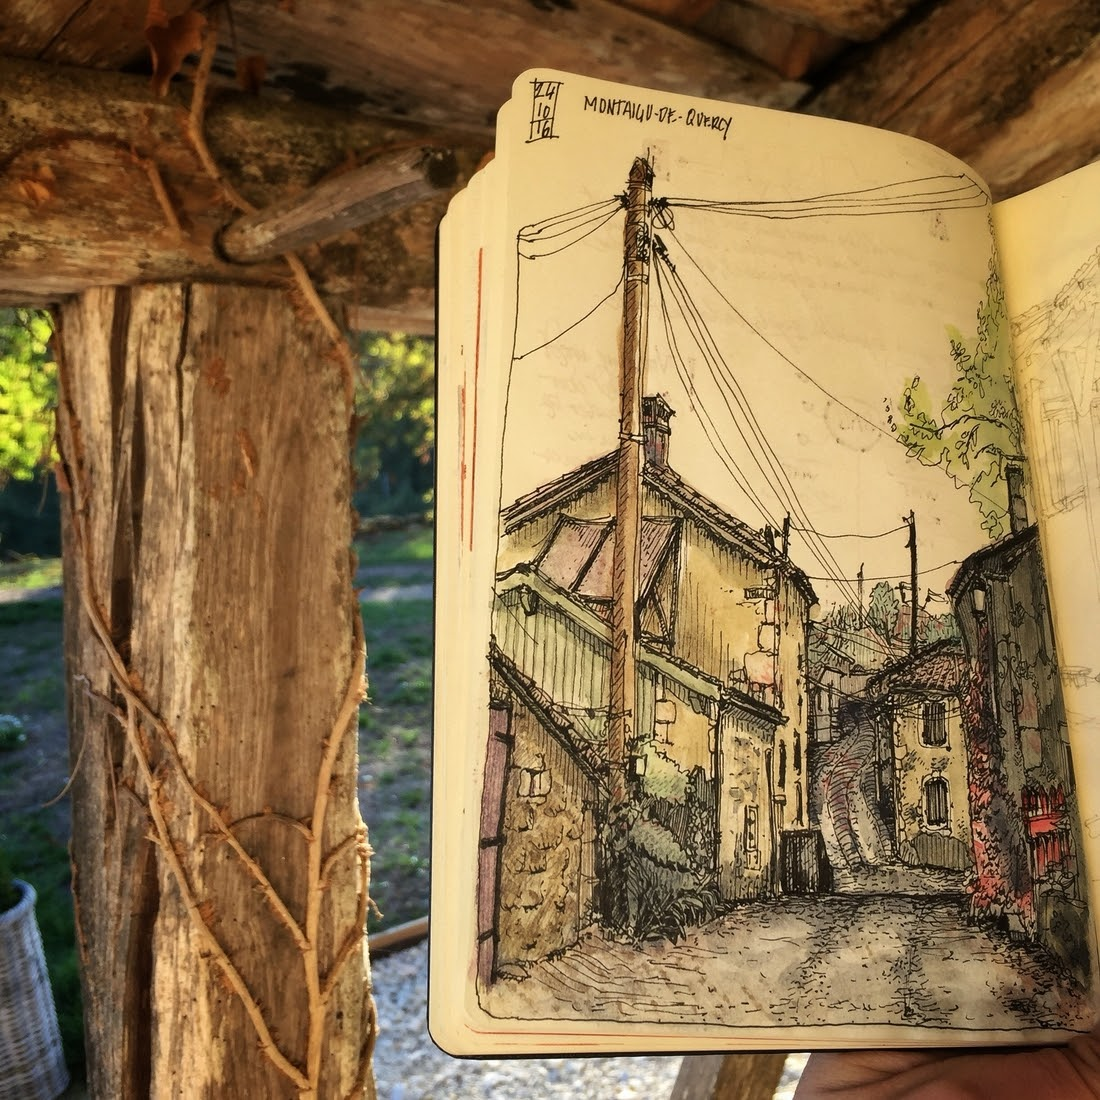 09-Lot-et-Garonne-dessinauteur-Urban-Sketches-and-Travel-Journals-on-Moleskine-www-designstack-co